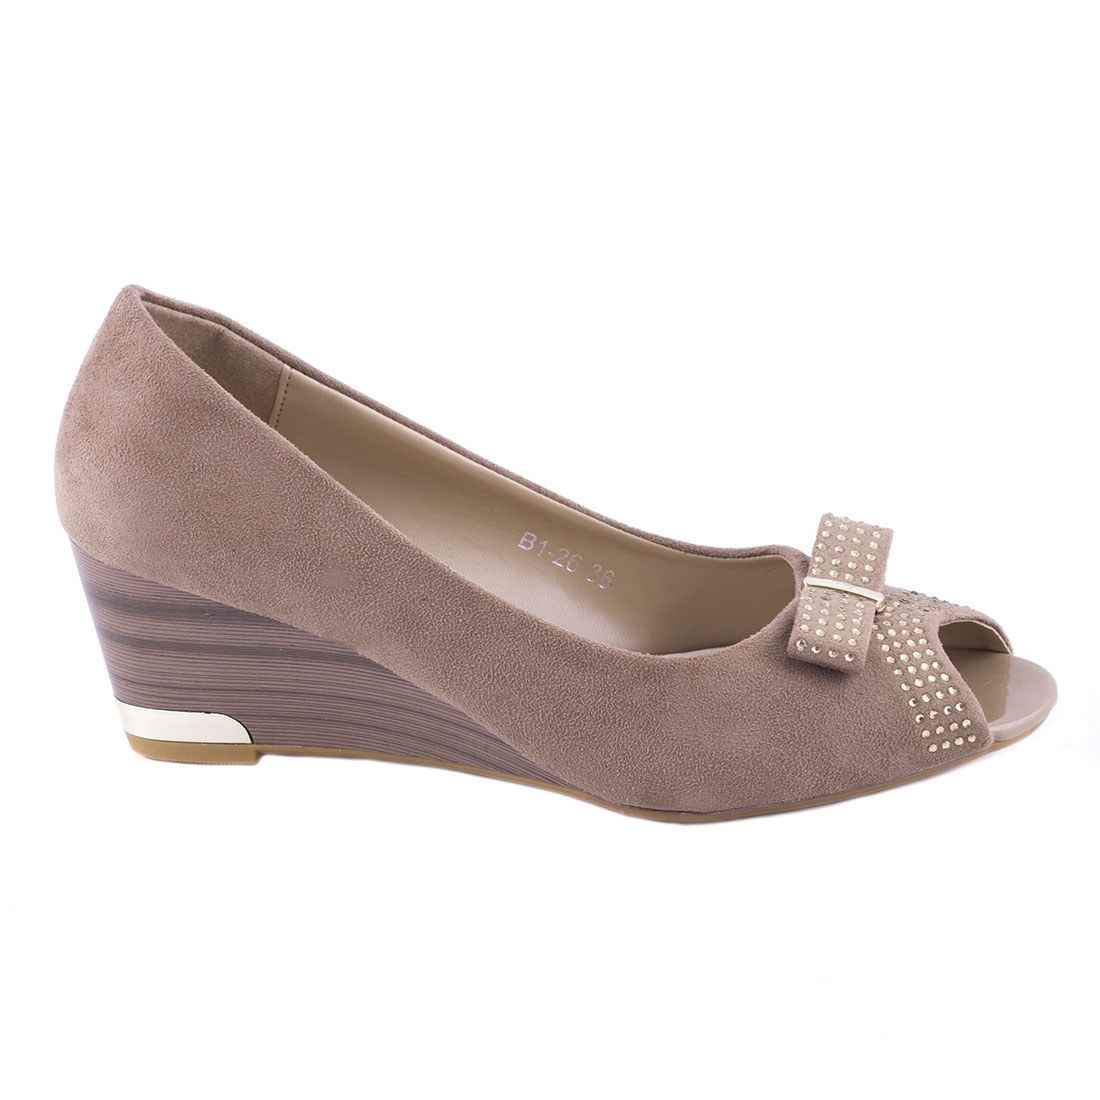 Pantofi dama cu fundita B1-26-KAKI